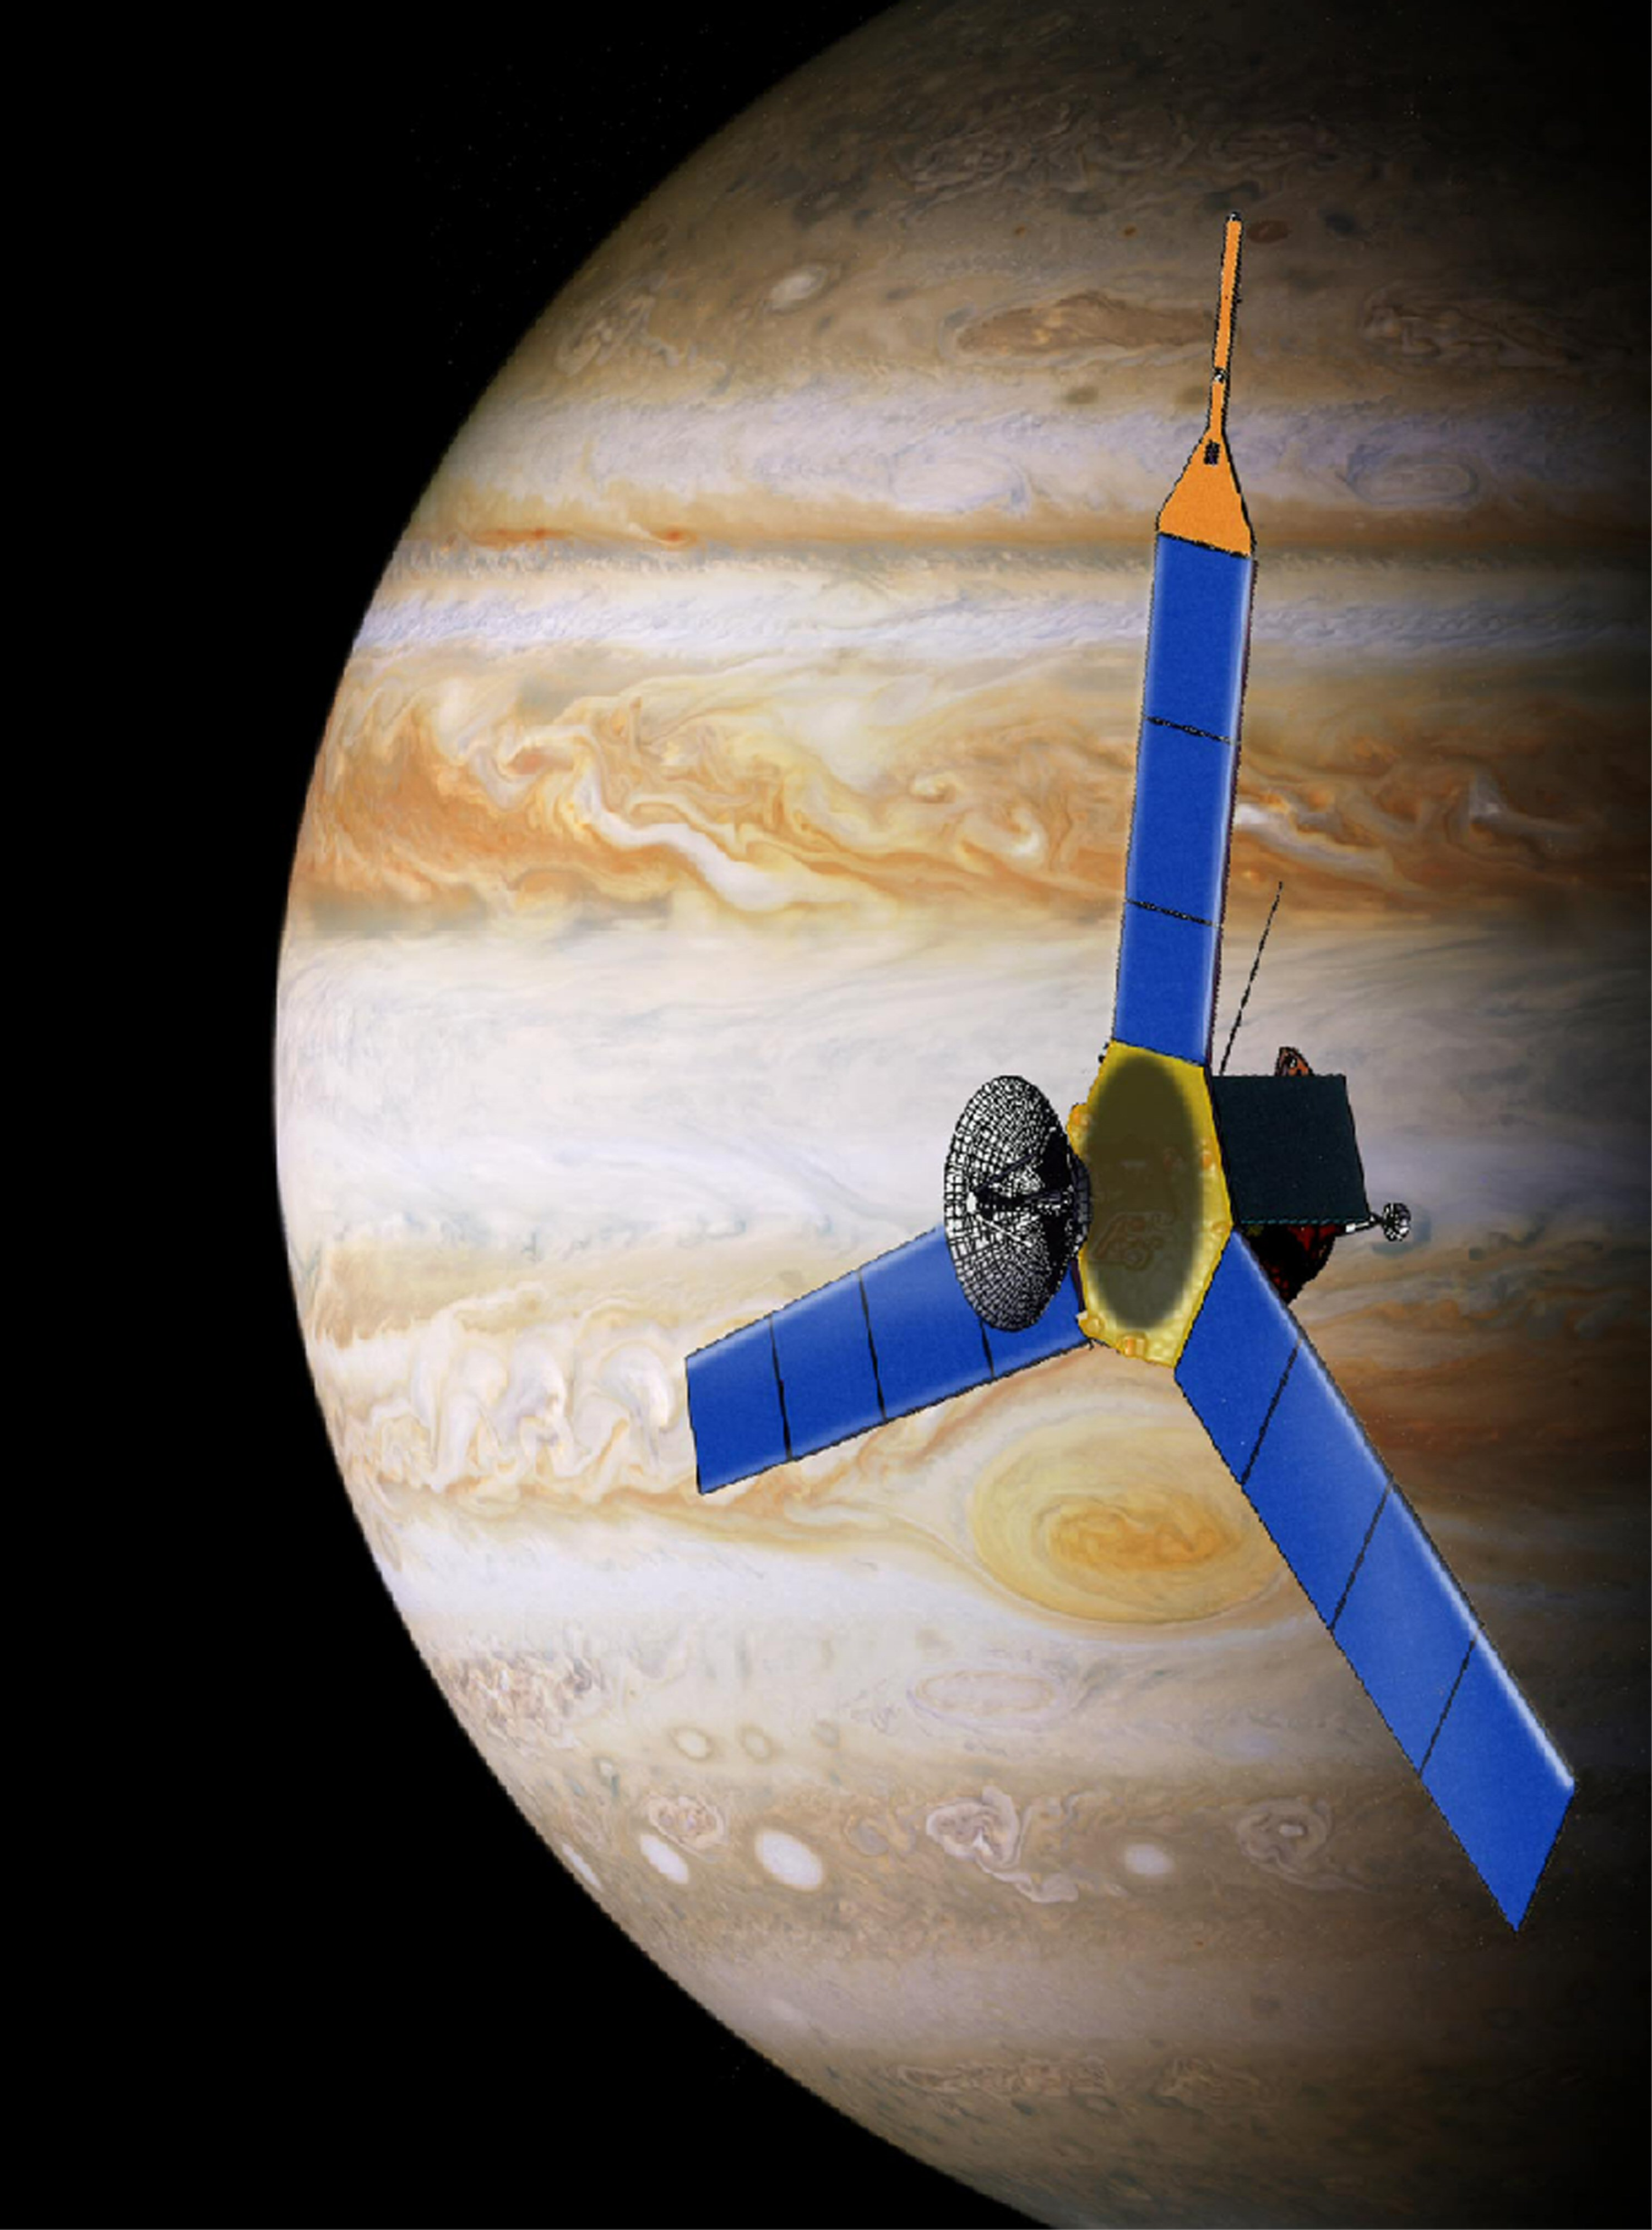 nasa space probes - photo #1